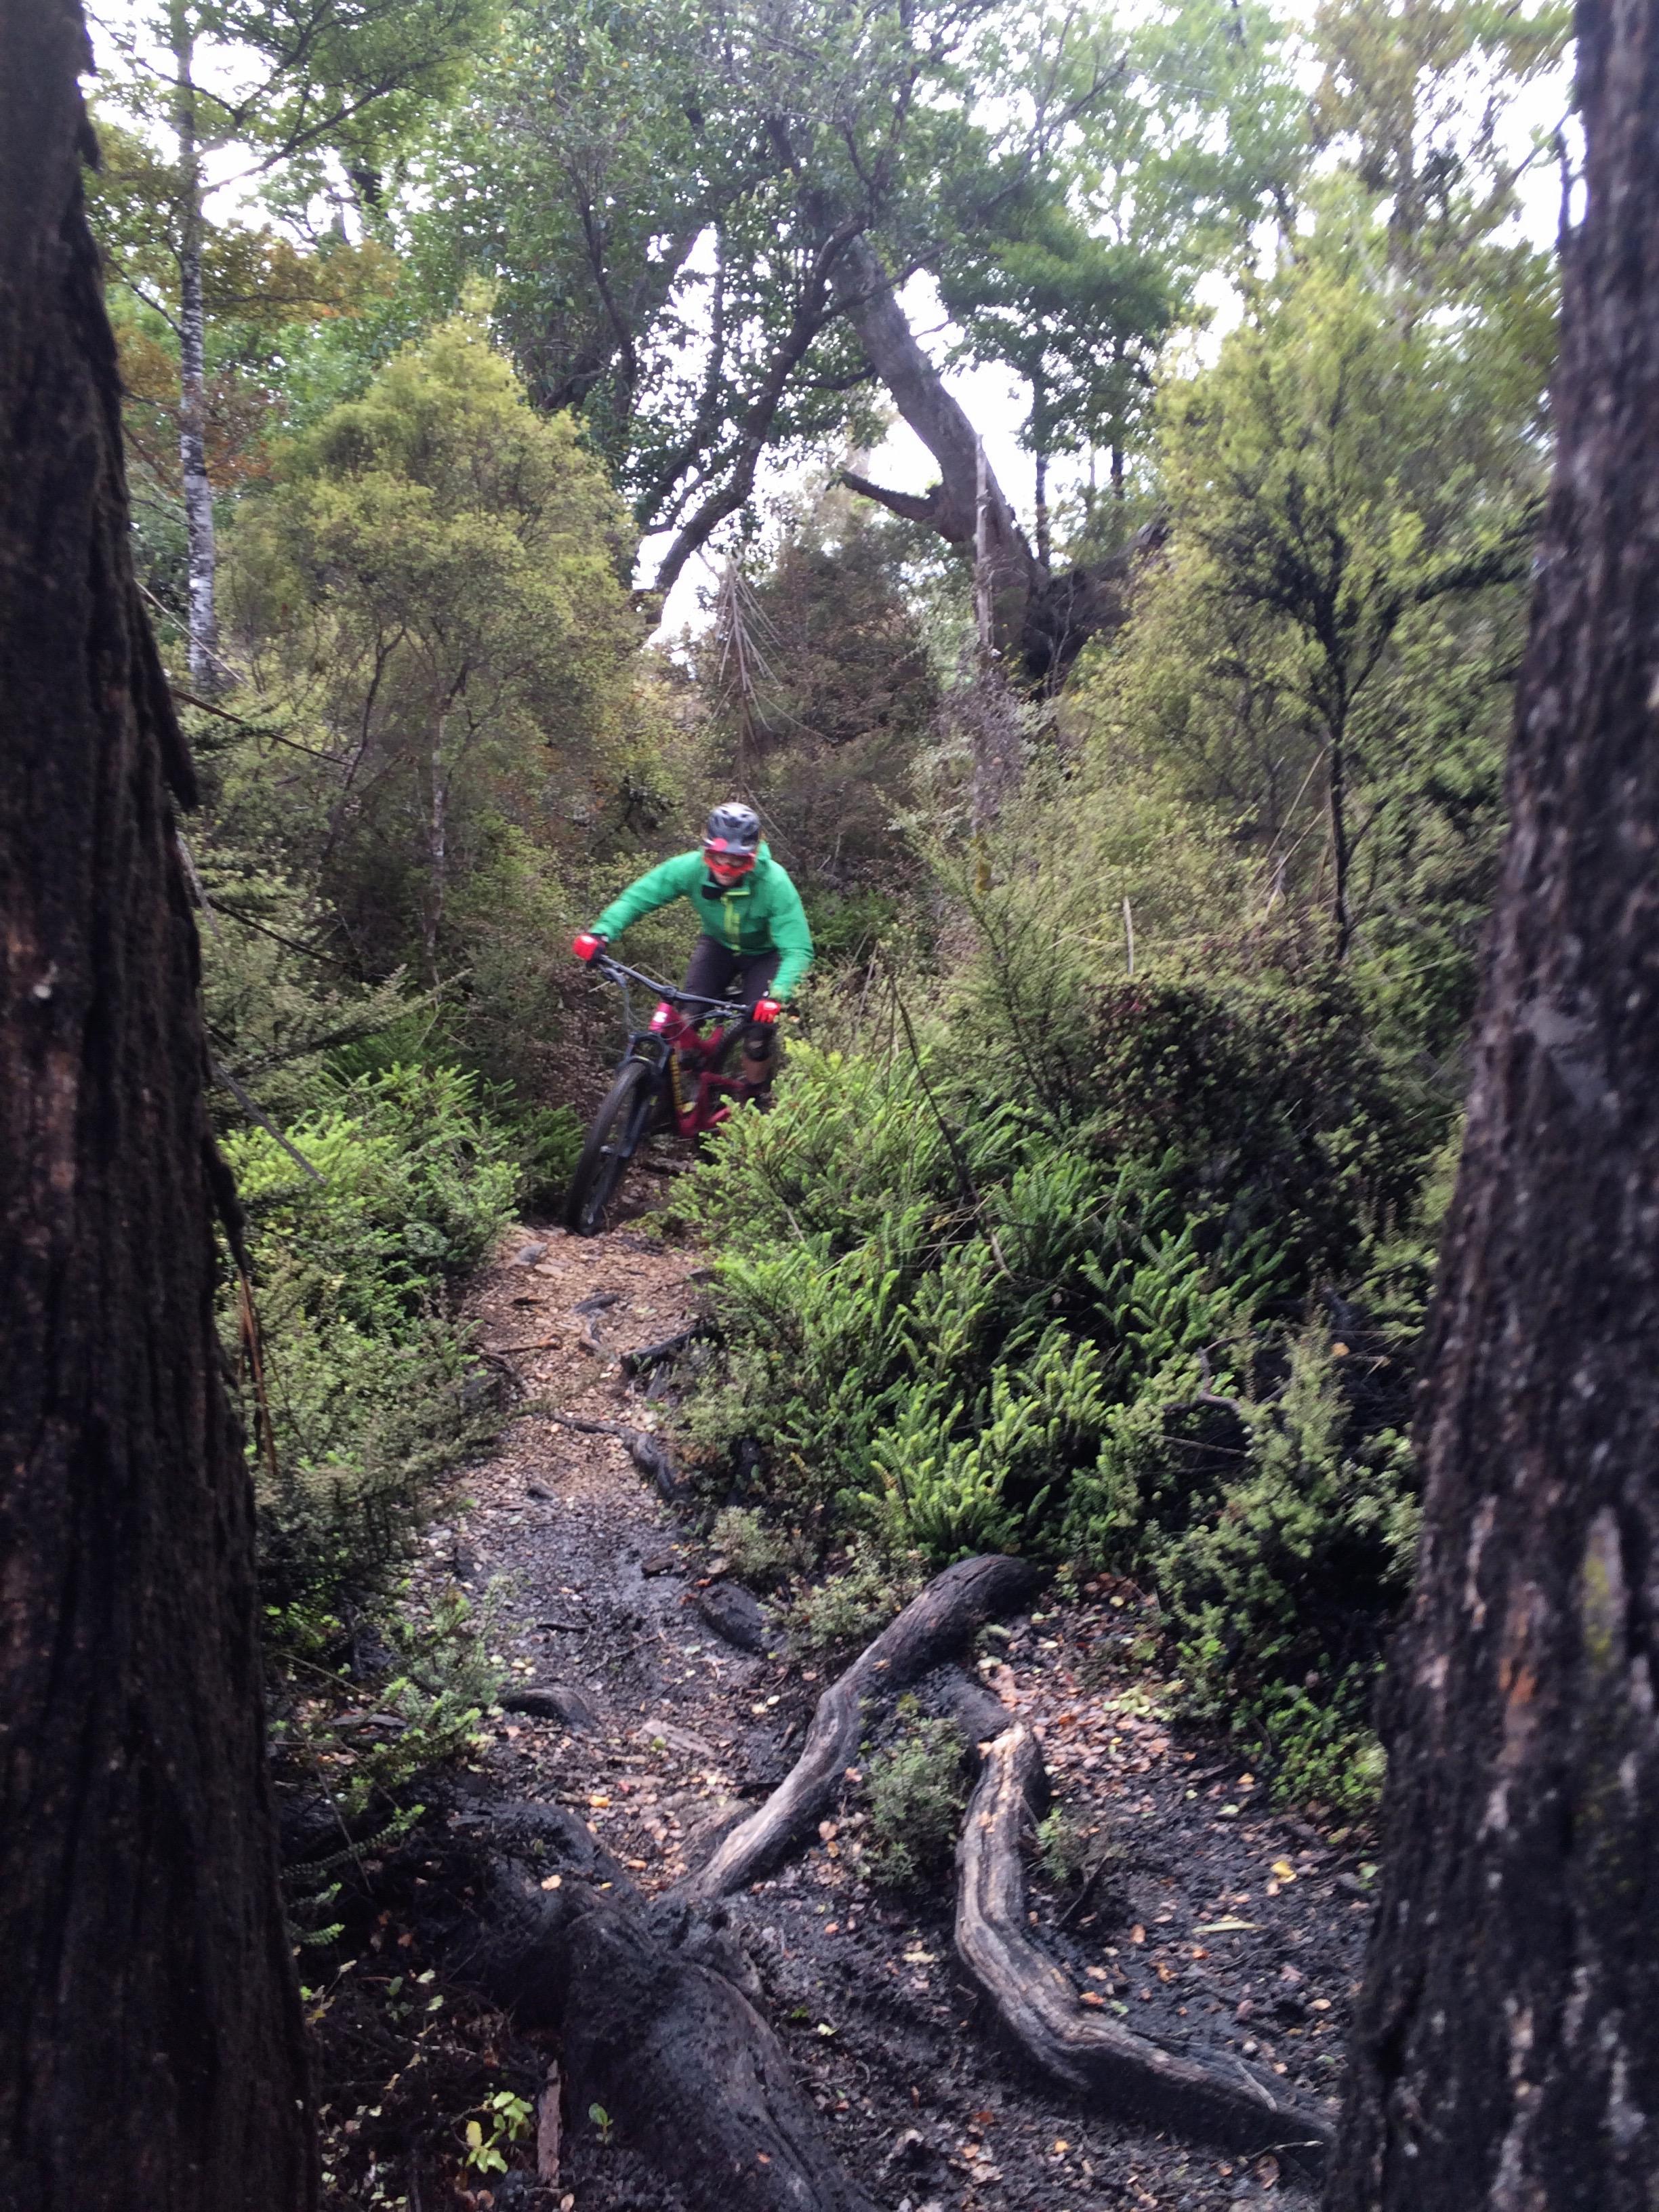 Too fast for my iPhone camera. Nick Crocker, Peaking Ridge.